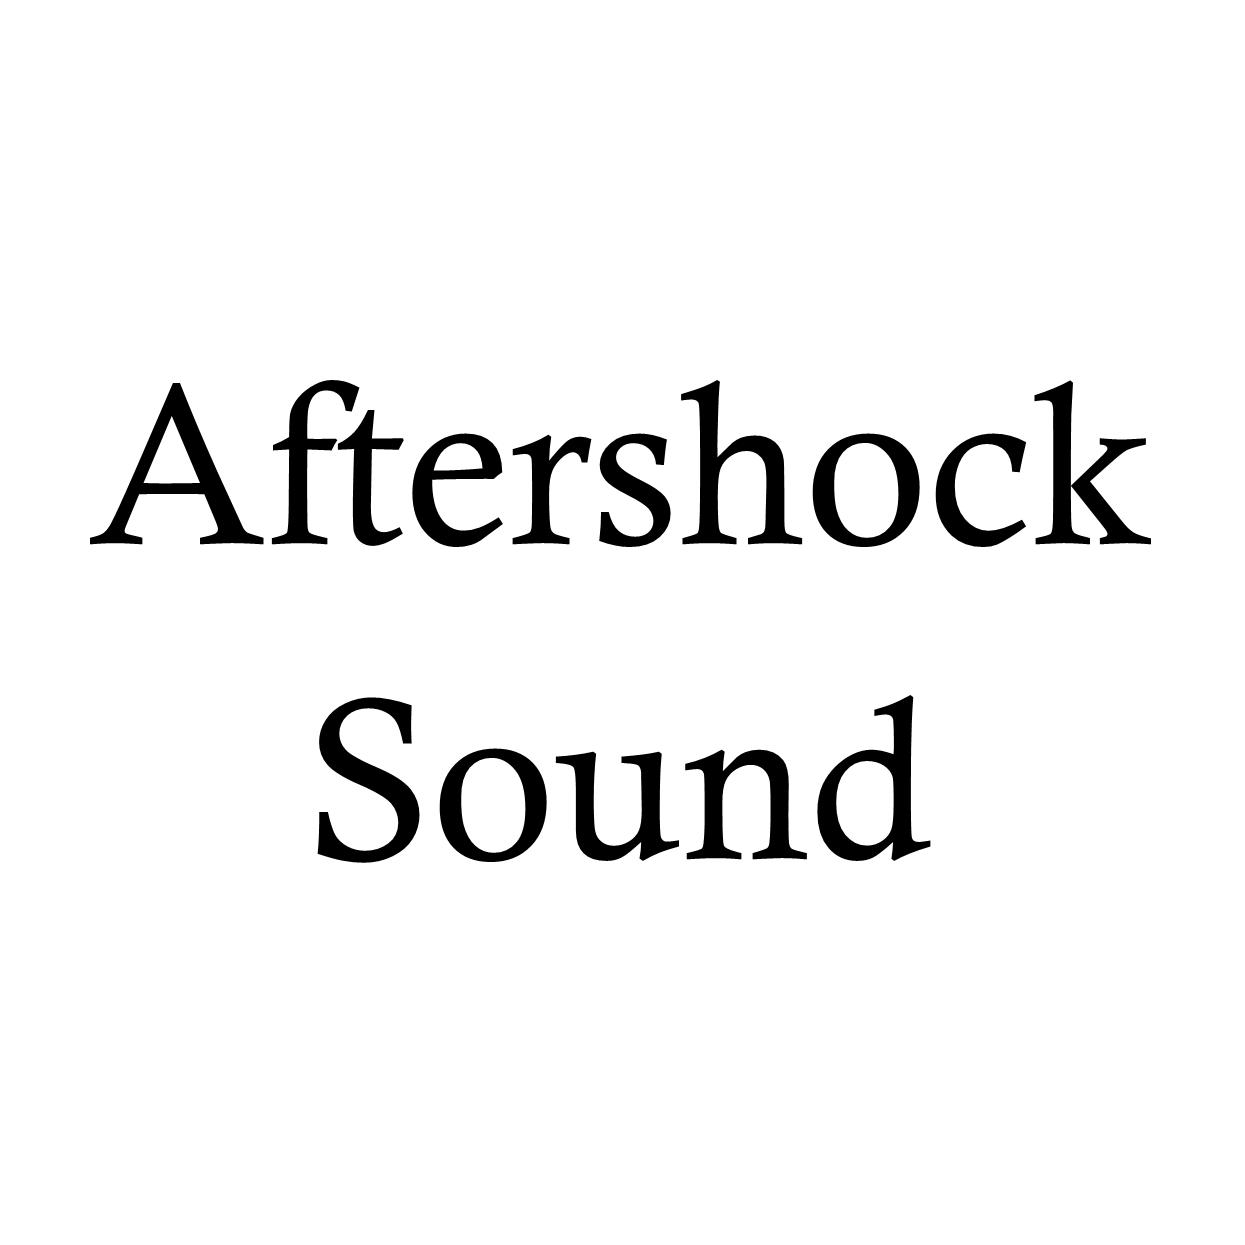 Aftershock Sound